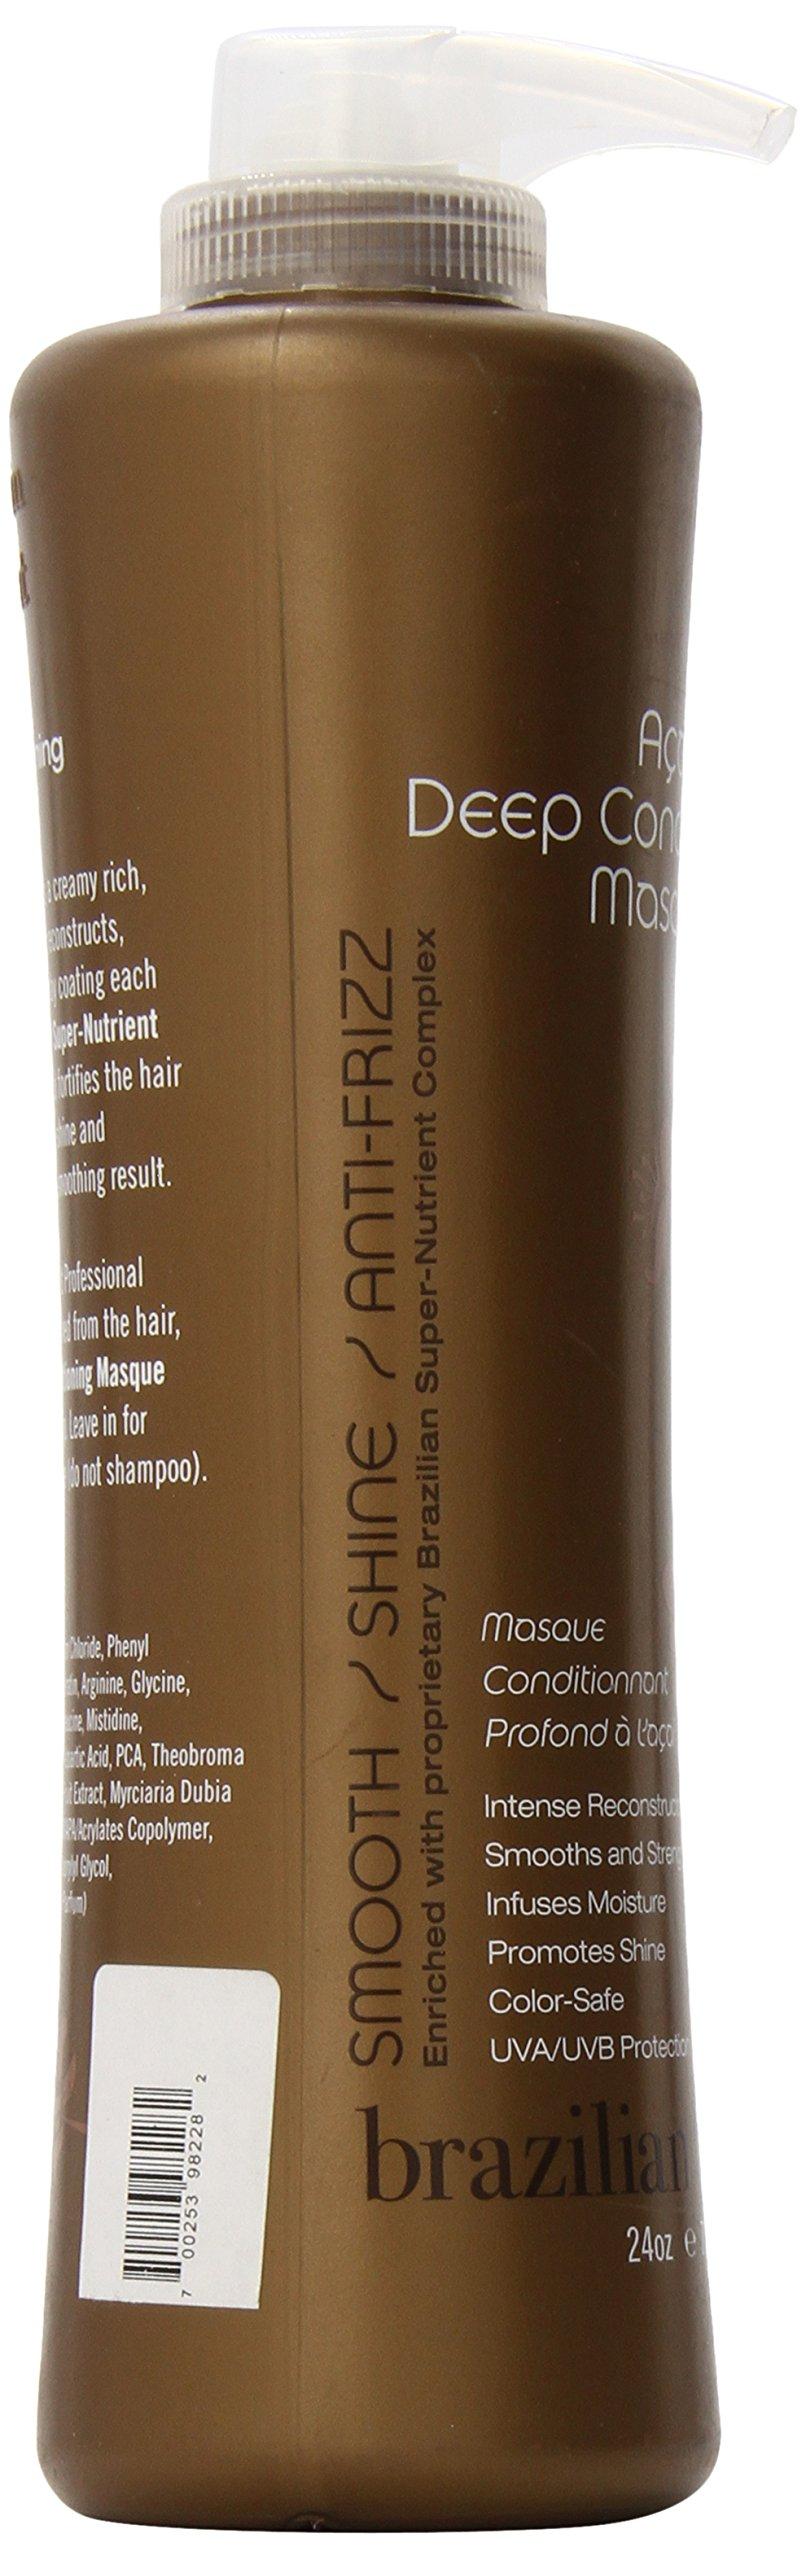 Brazilian Blowout Deep Conditioning Masque, 24 Fluid Ounce